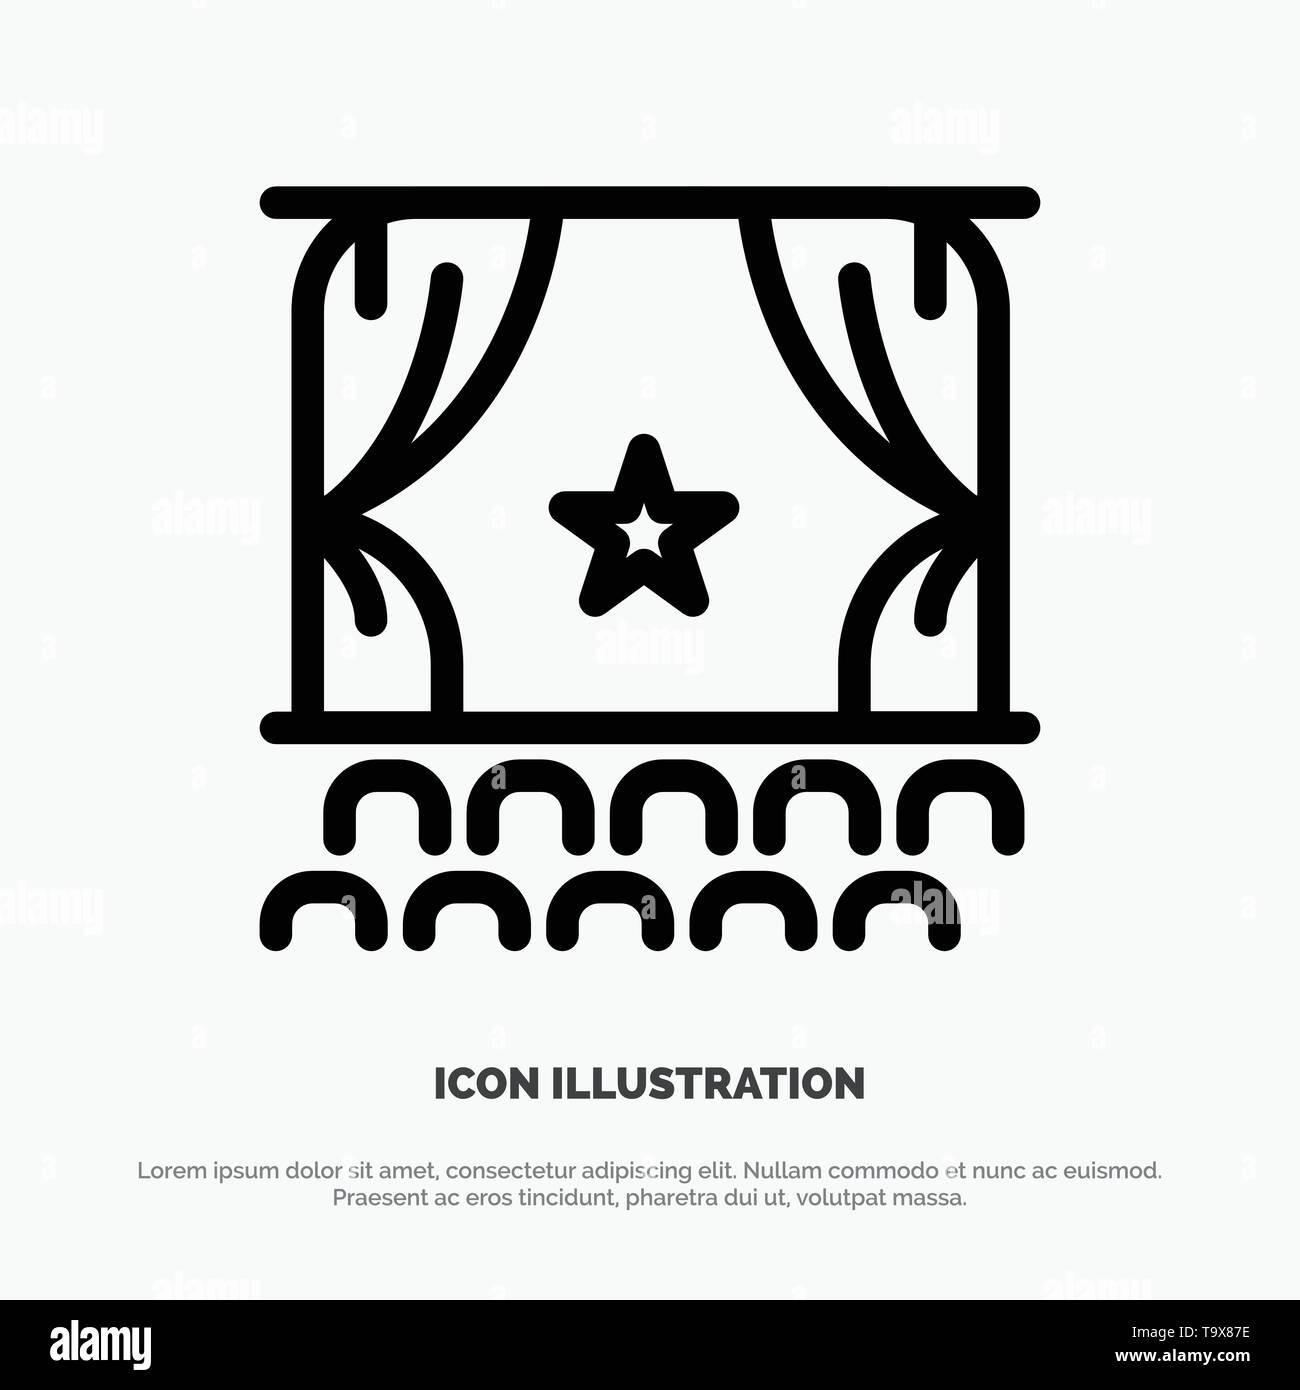 Cinema, Debut, Film, Performance, Premiere Line Icon Vector - Stock Image